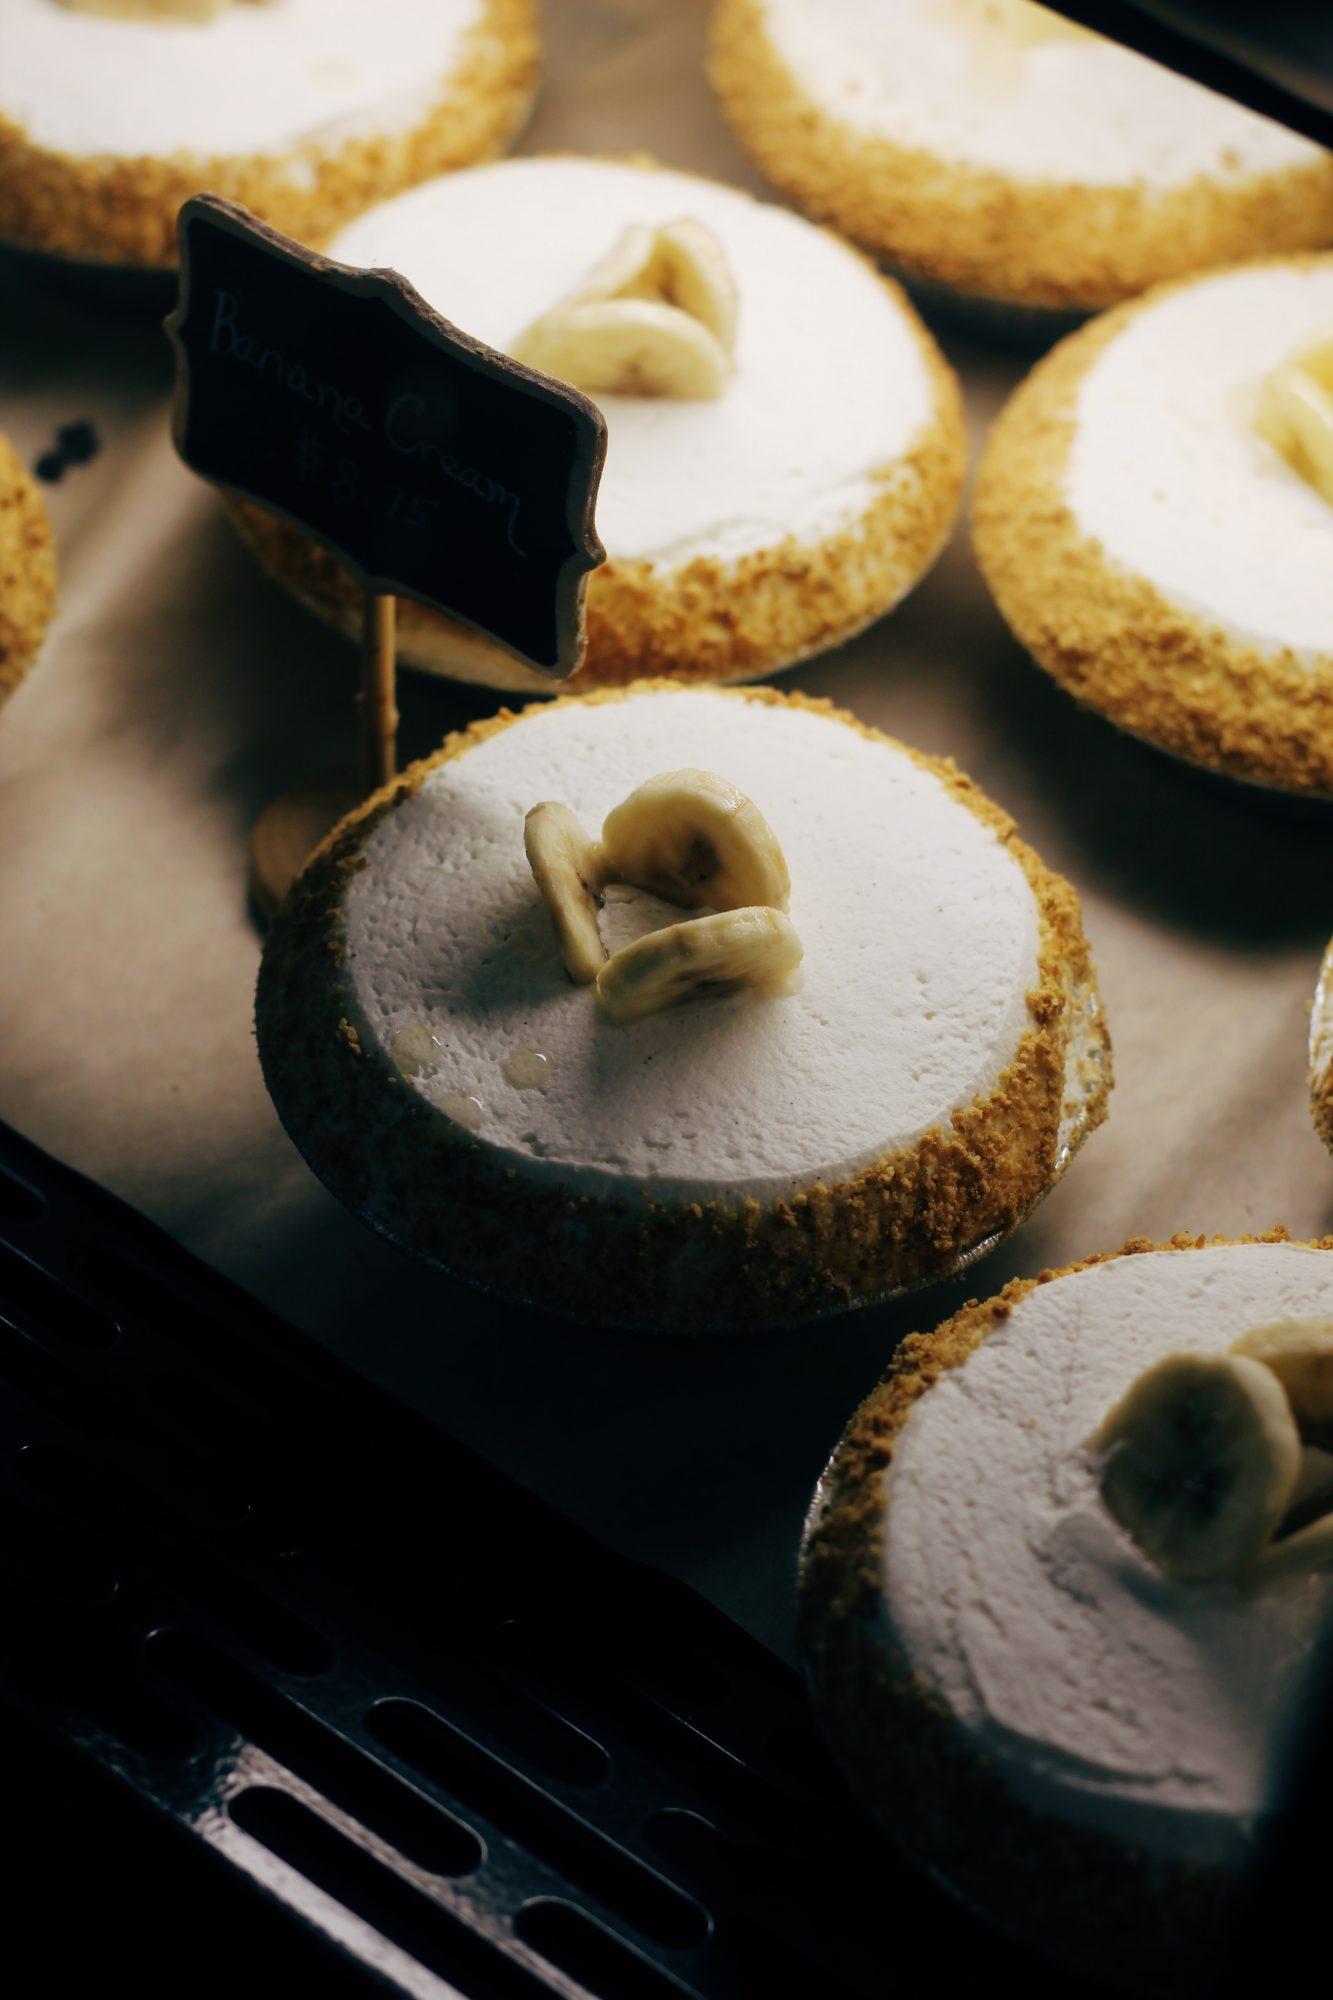 Best Restaurants in Maui: Leoda's Pie House